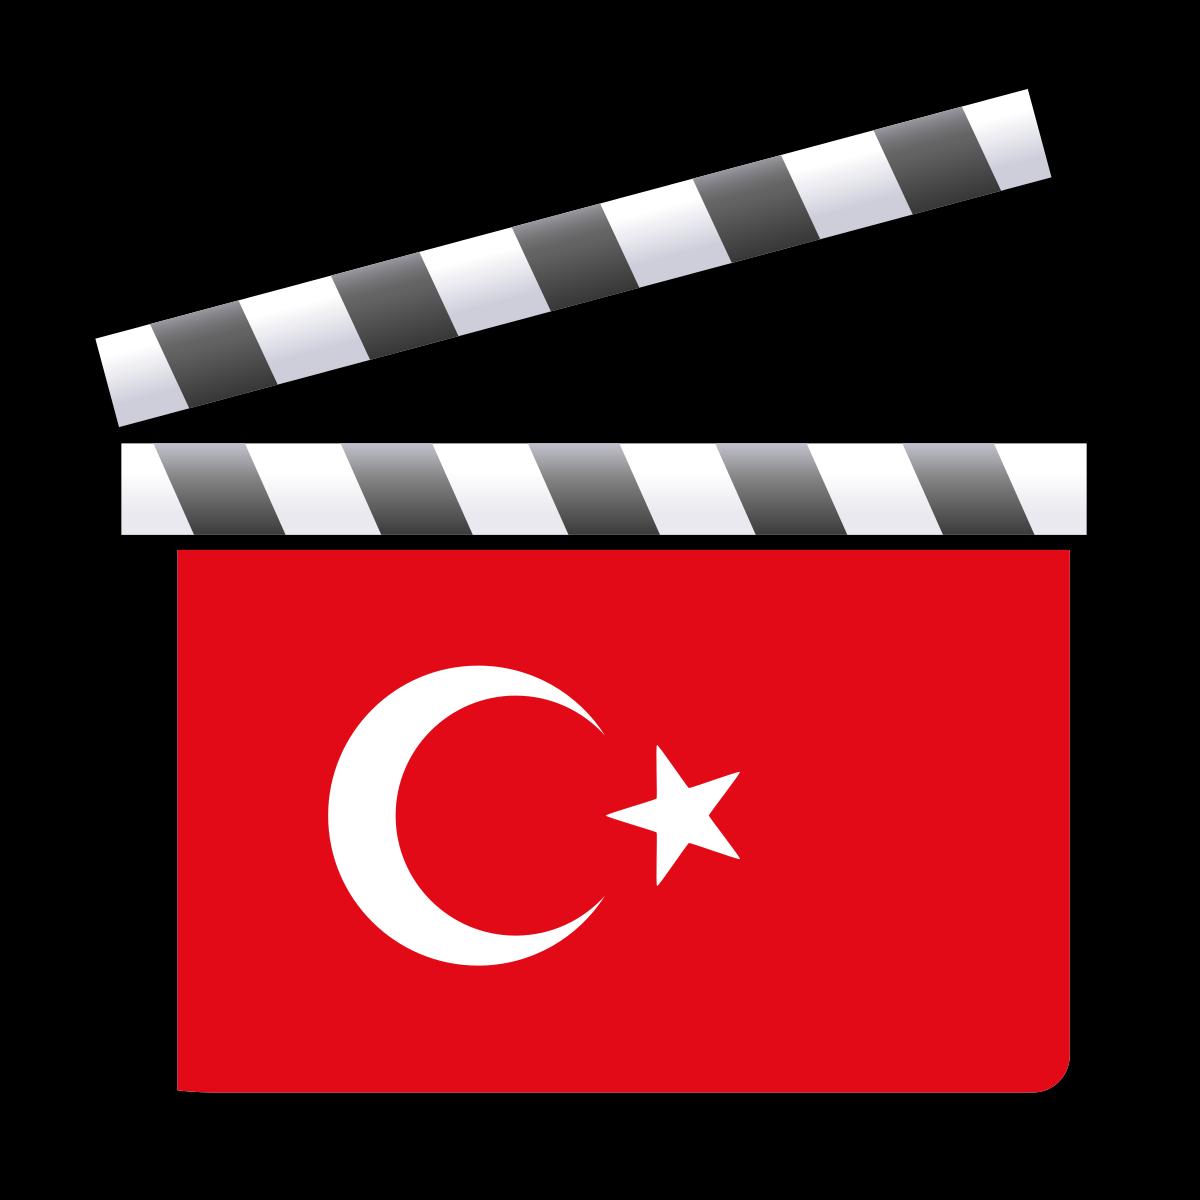 Film clipart film study. Cinema of turkey wikipedia